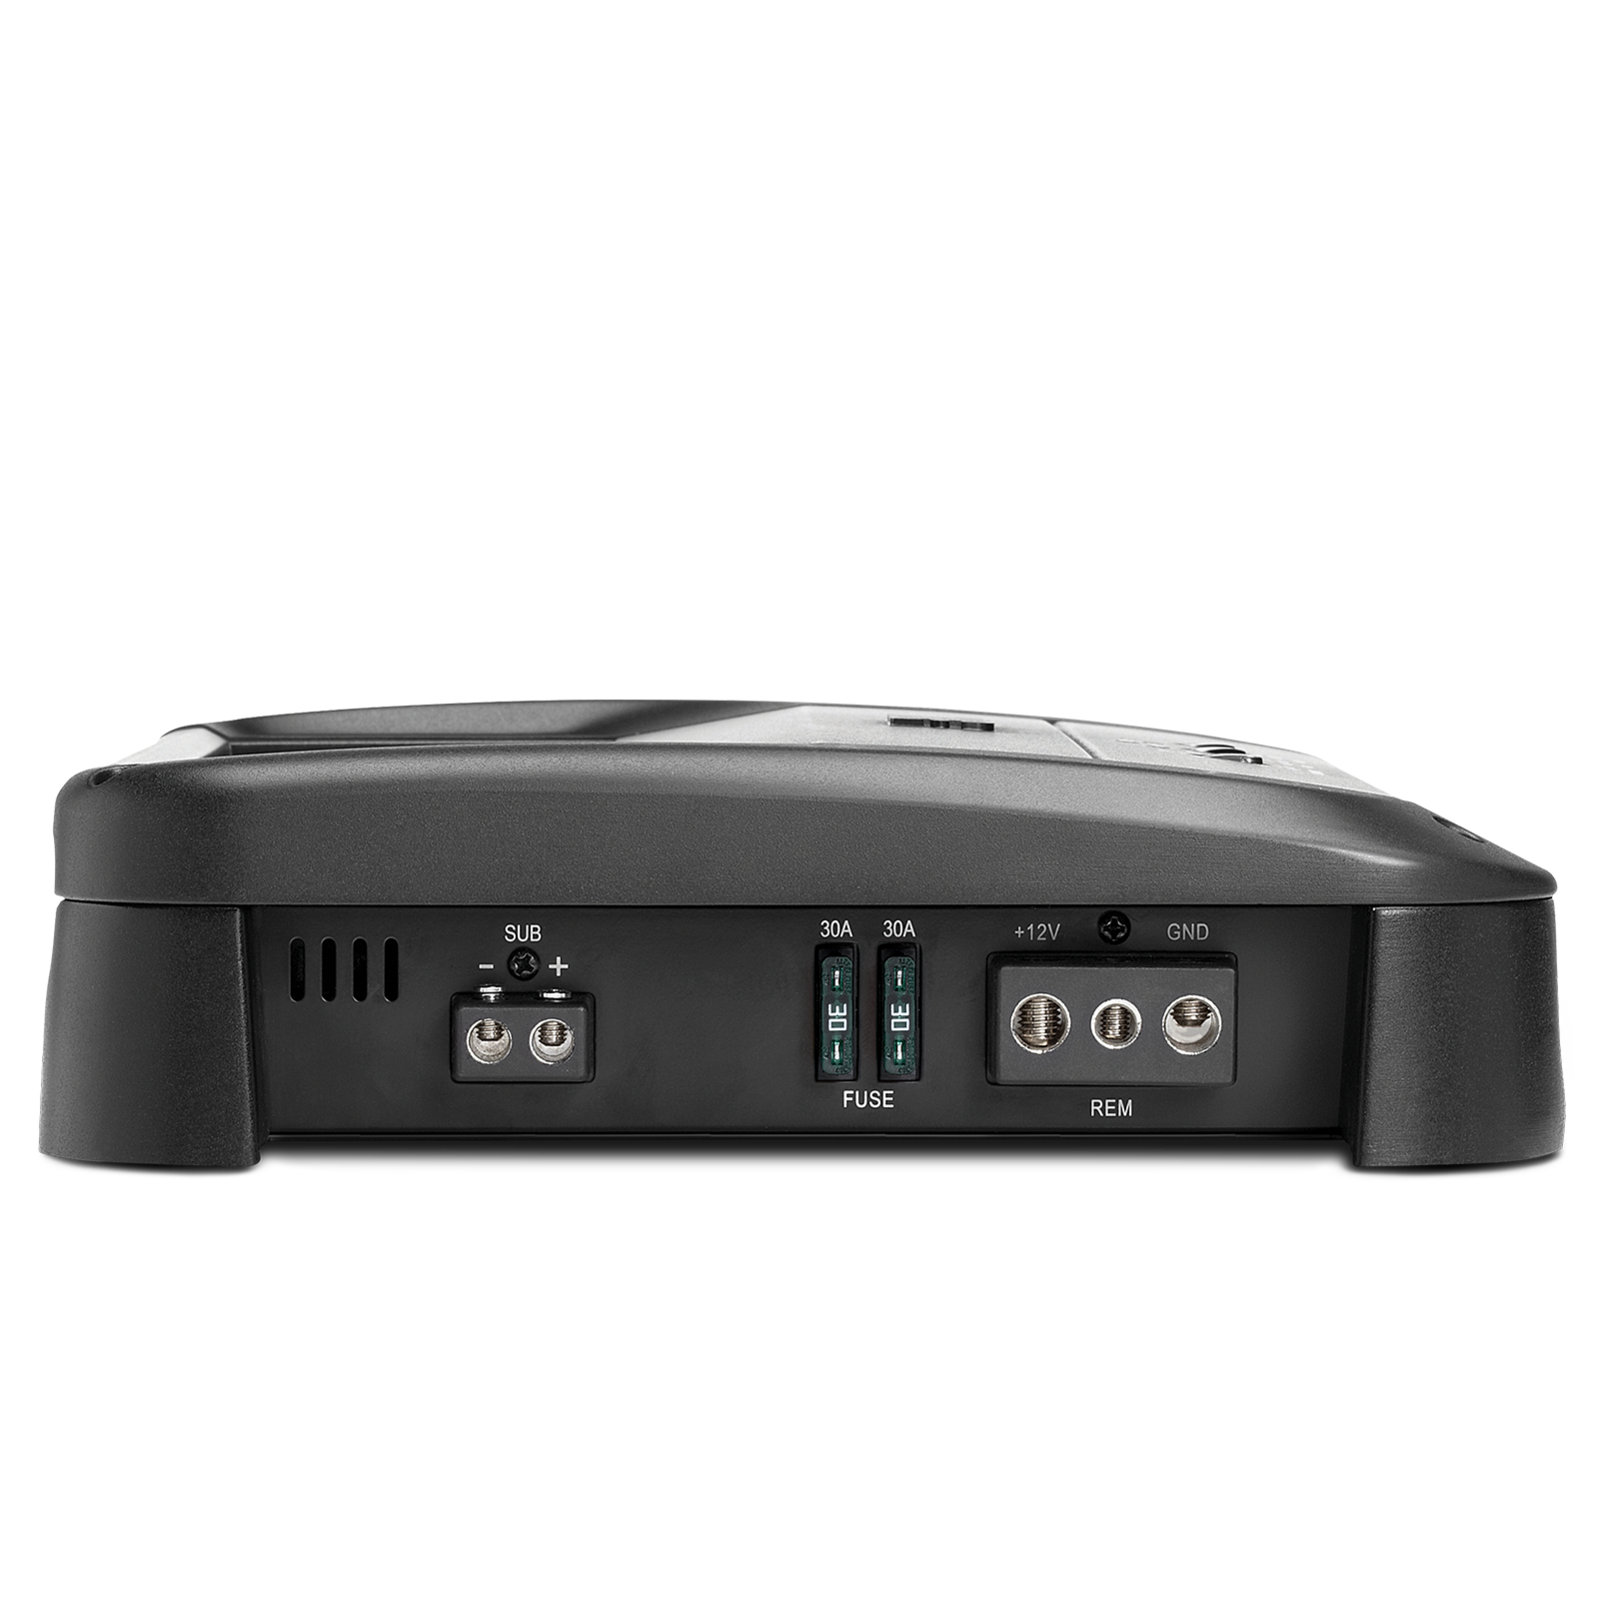 Gto 751ez Powerful 1200 Watt Car Subwoofer Amplifier Boosteramplifierforcarstereouse Automotivecircuit Circuit Alternate Views